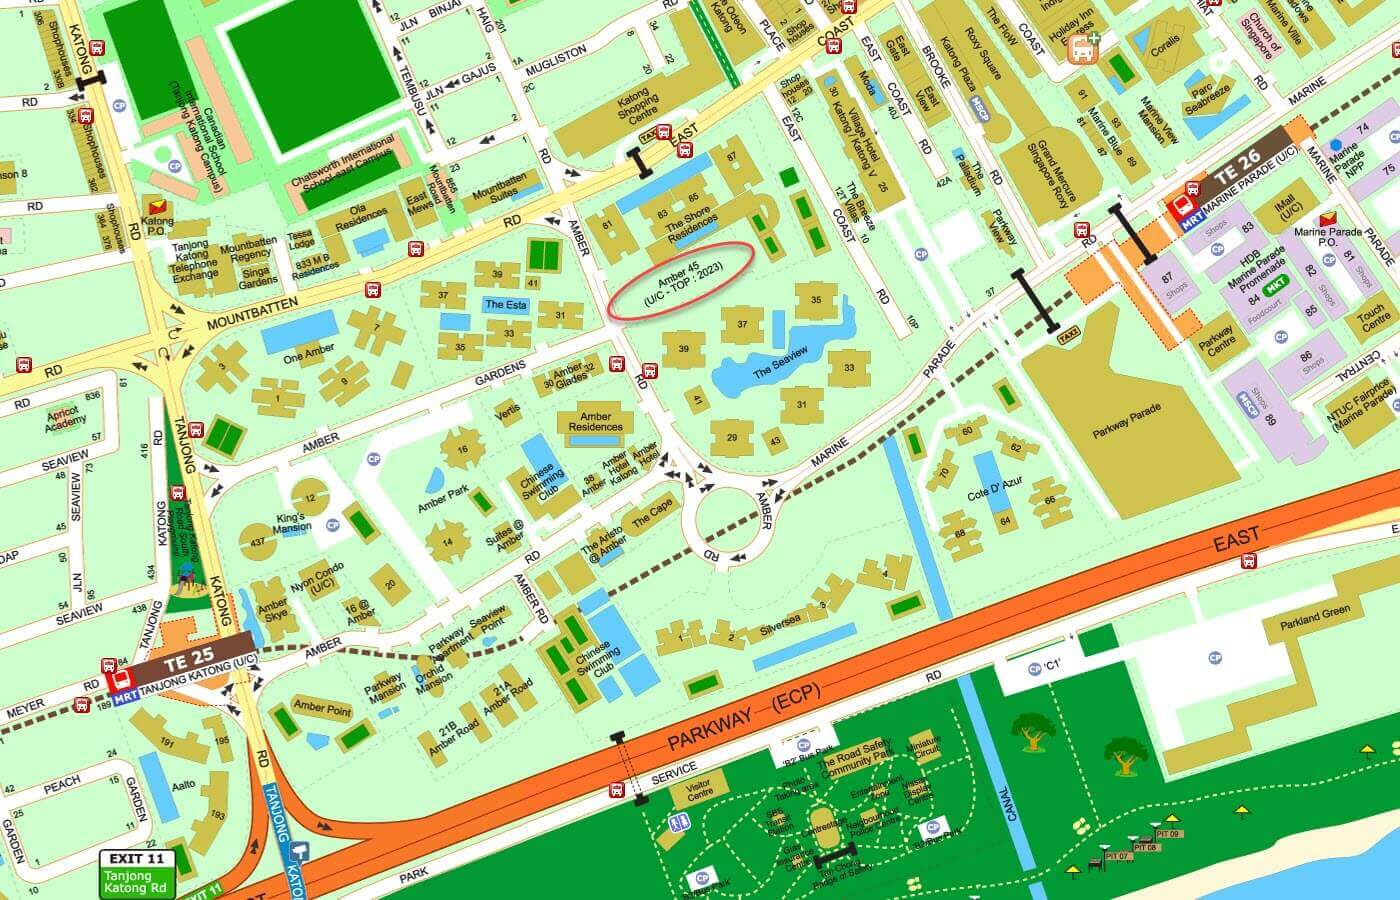 Amber 45 Condo Street Directory Map